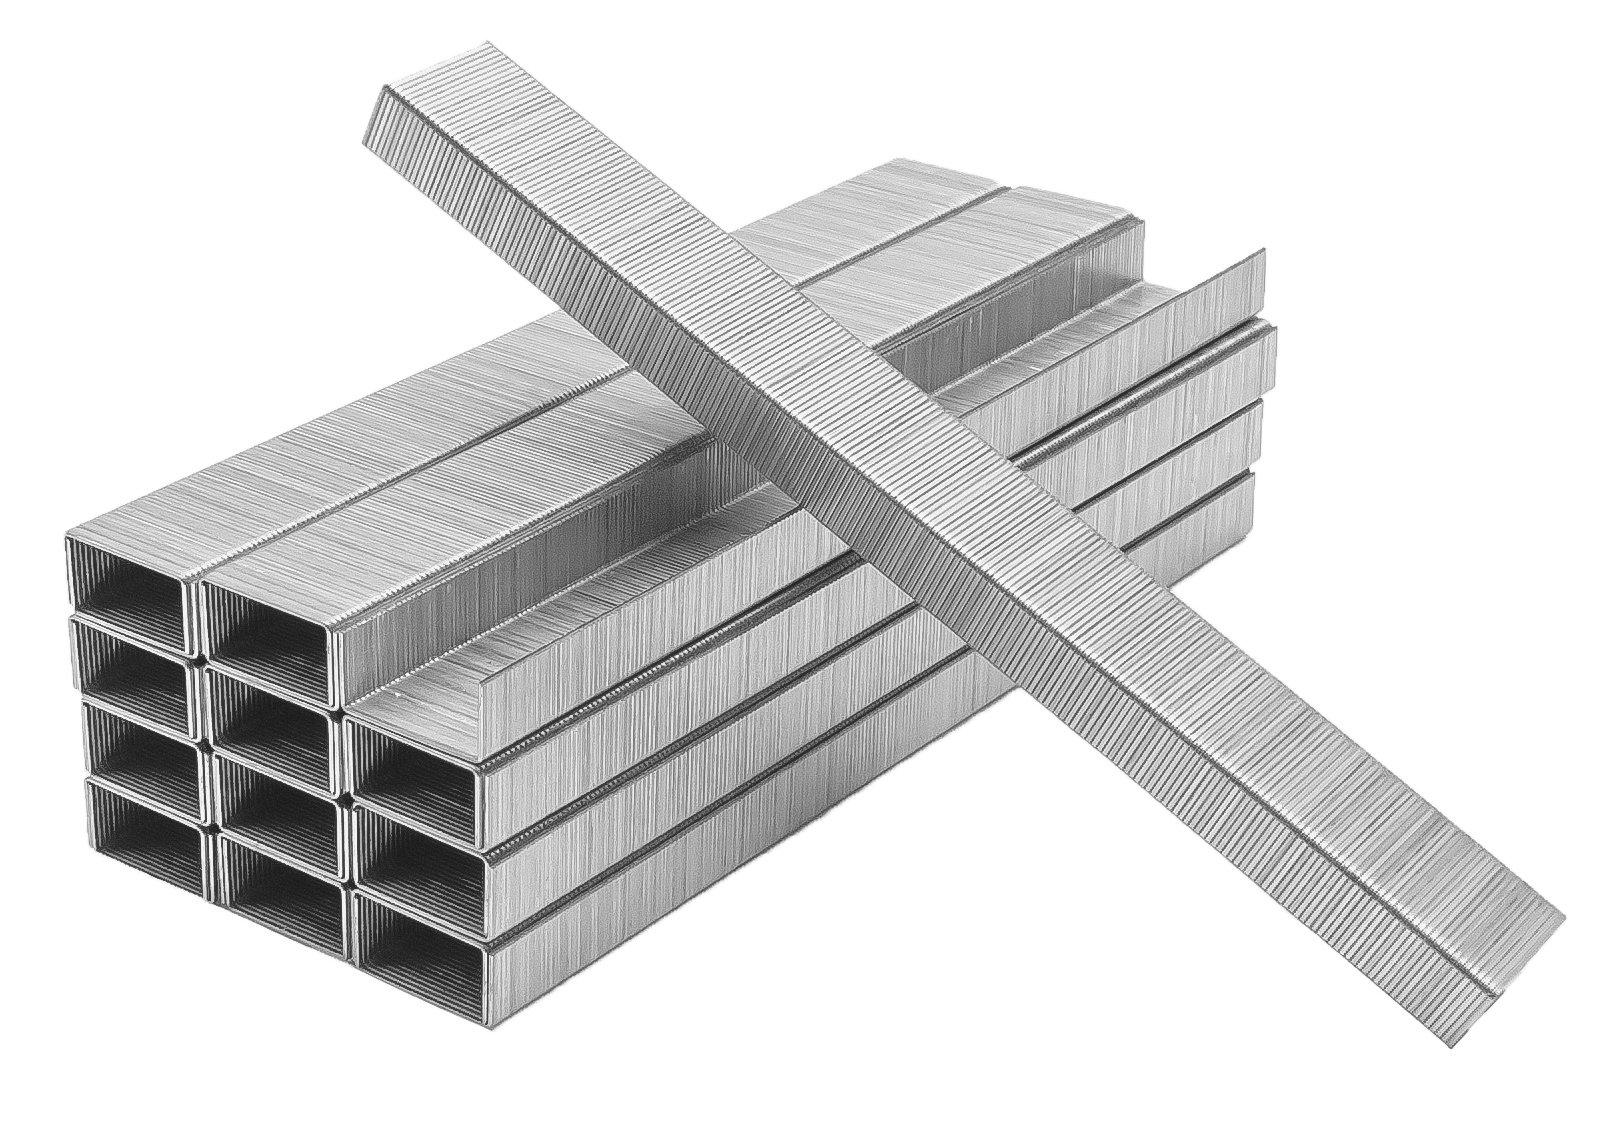 Premium Standard Staples, Full Strip, Size (26/6) Silver, 25000 total staples, PraxxisPro Office Supplies